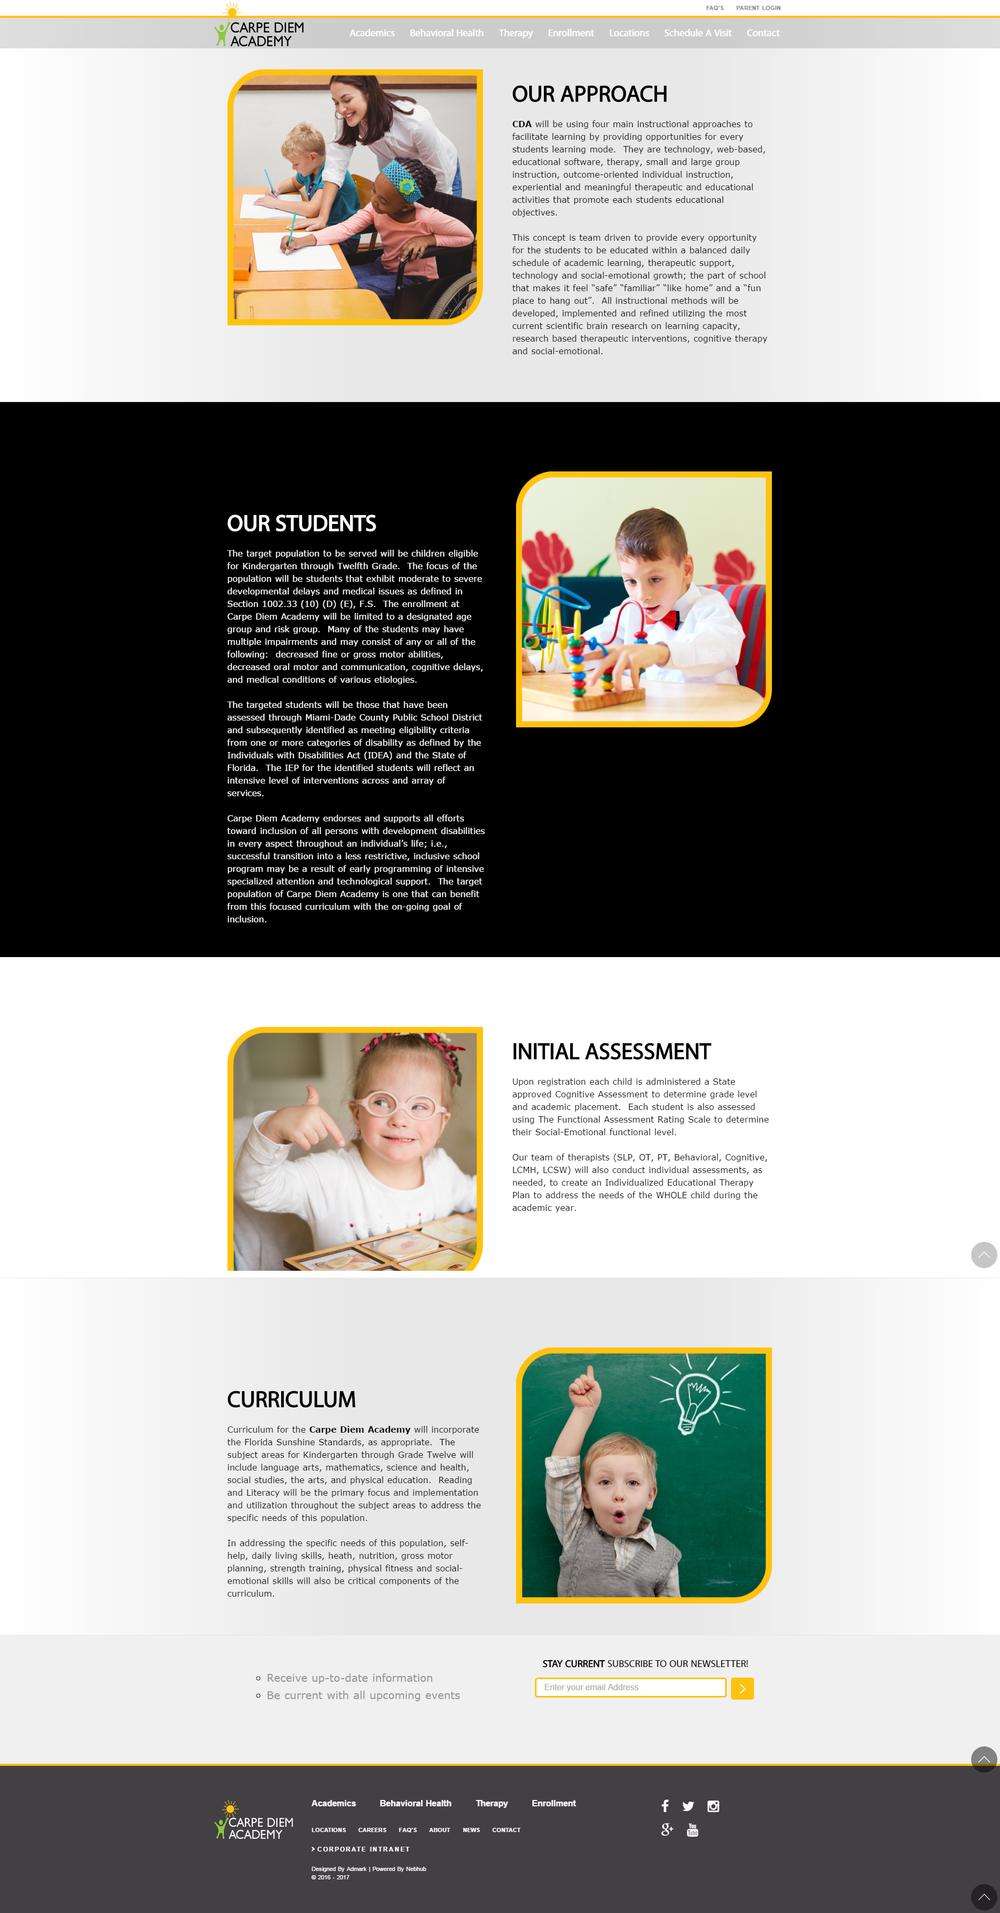 Carpe Diem Academy website